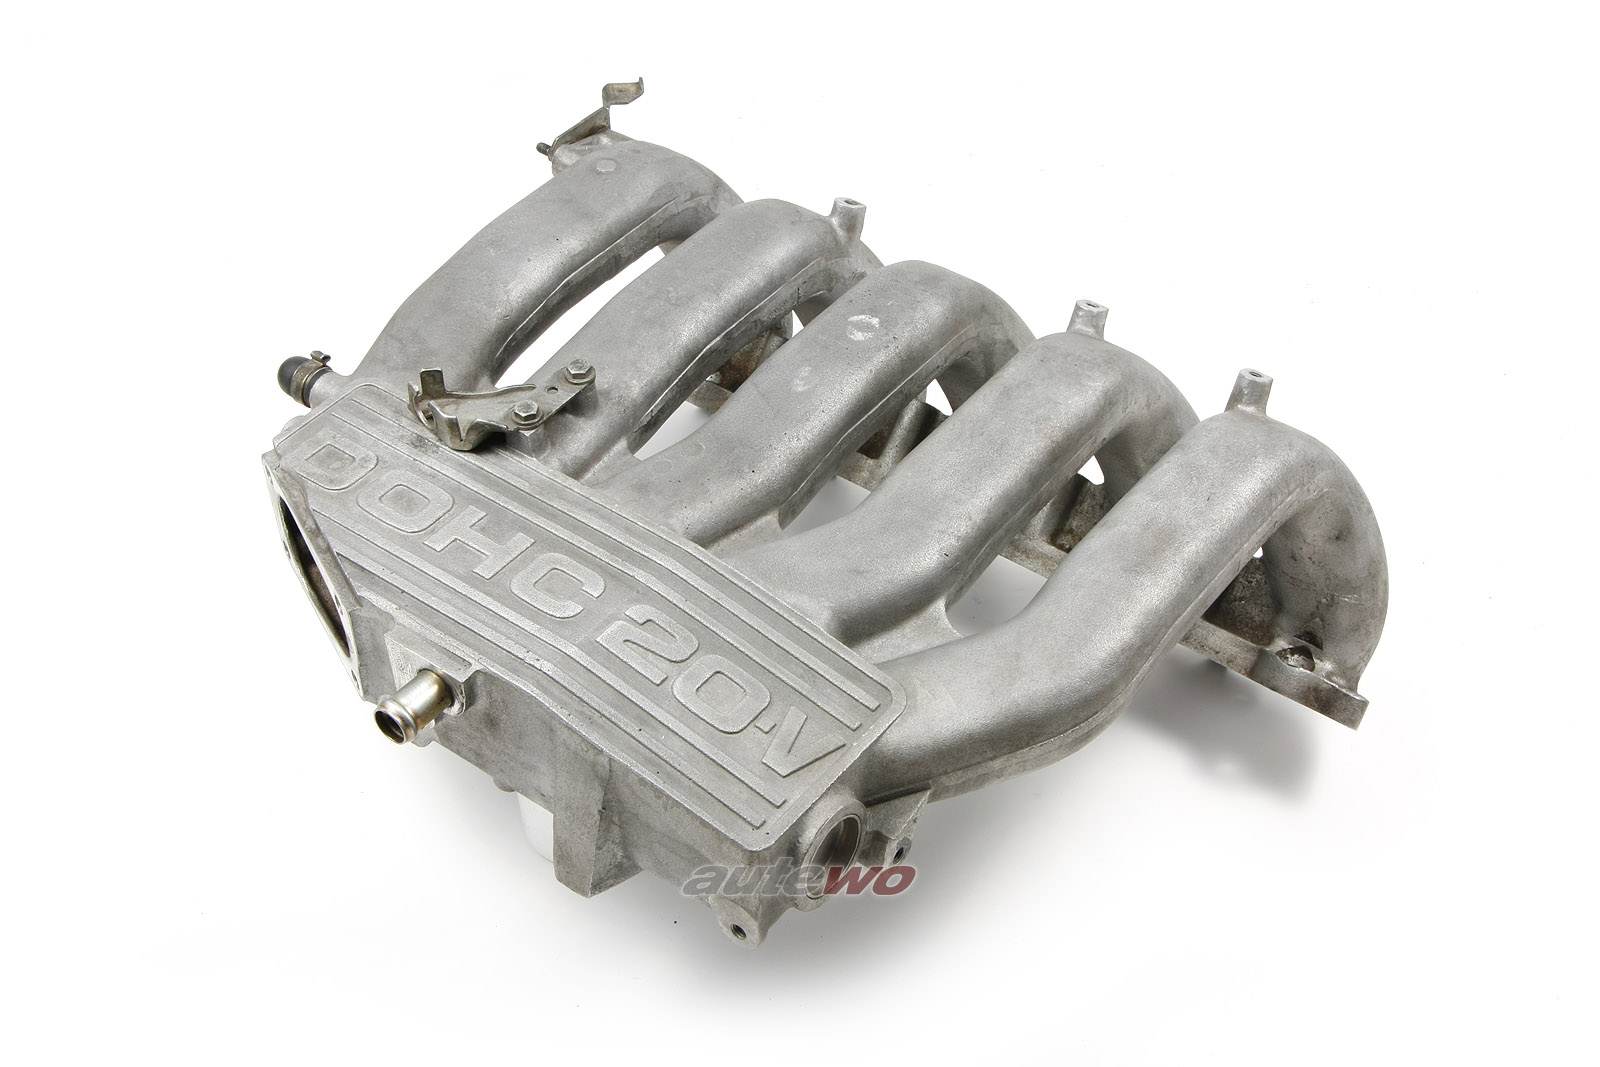 054133201G 034133223C Audi 90 20V/Coupe Typ 89 20V 2.2l 20V 7A/NM Saugrohr